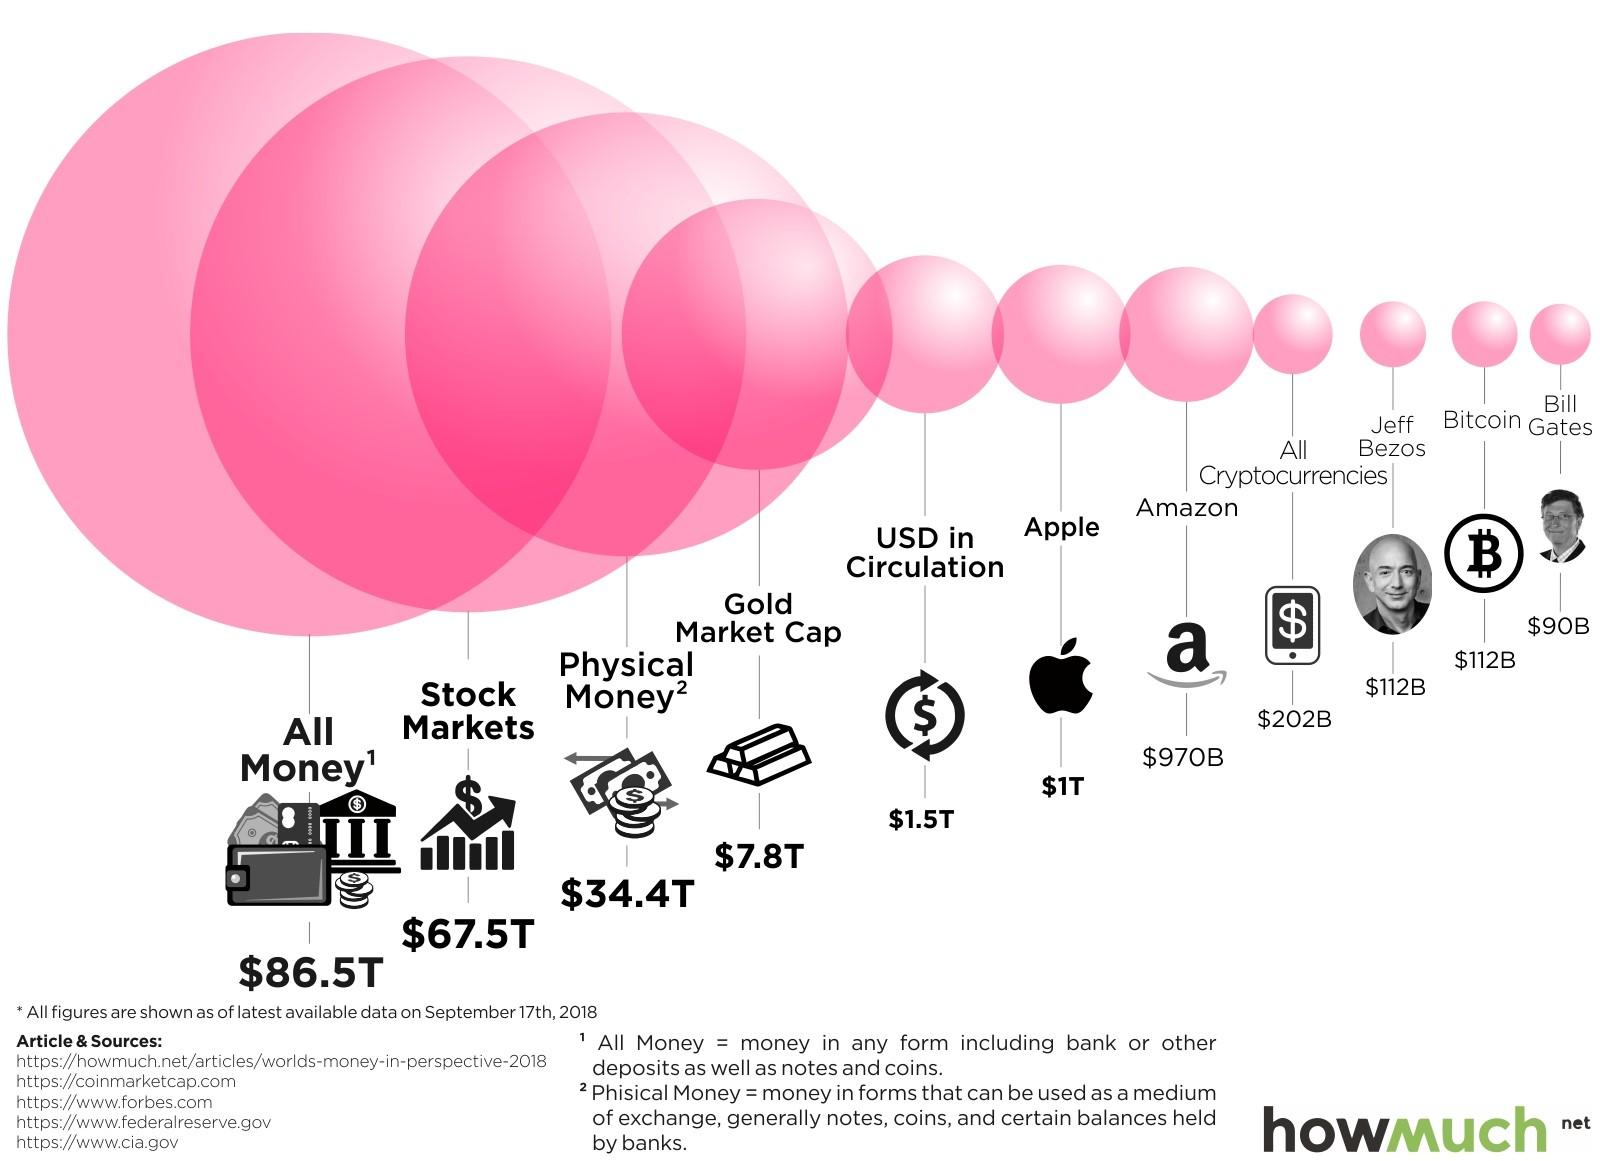 bitcoin-money-economy-in-perspective copy 2018-09.jpg